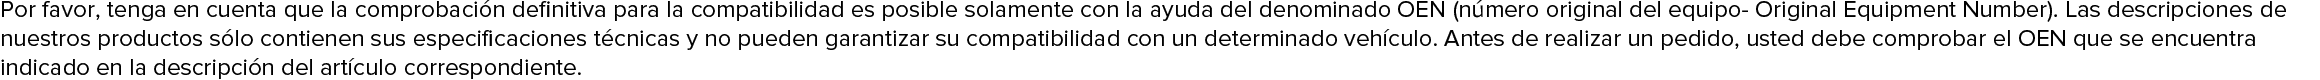 MASTER-SPORT XD 9060 E, 520 4302 0, 1C0 127 401, 1CO 127 401, 1J0 127 399 A Filtro combustible